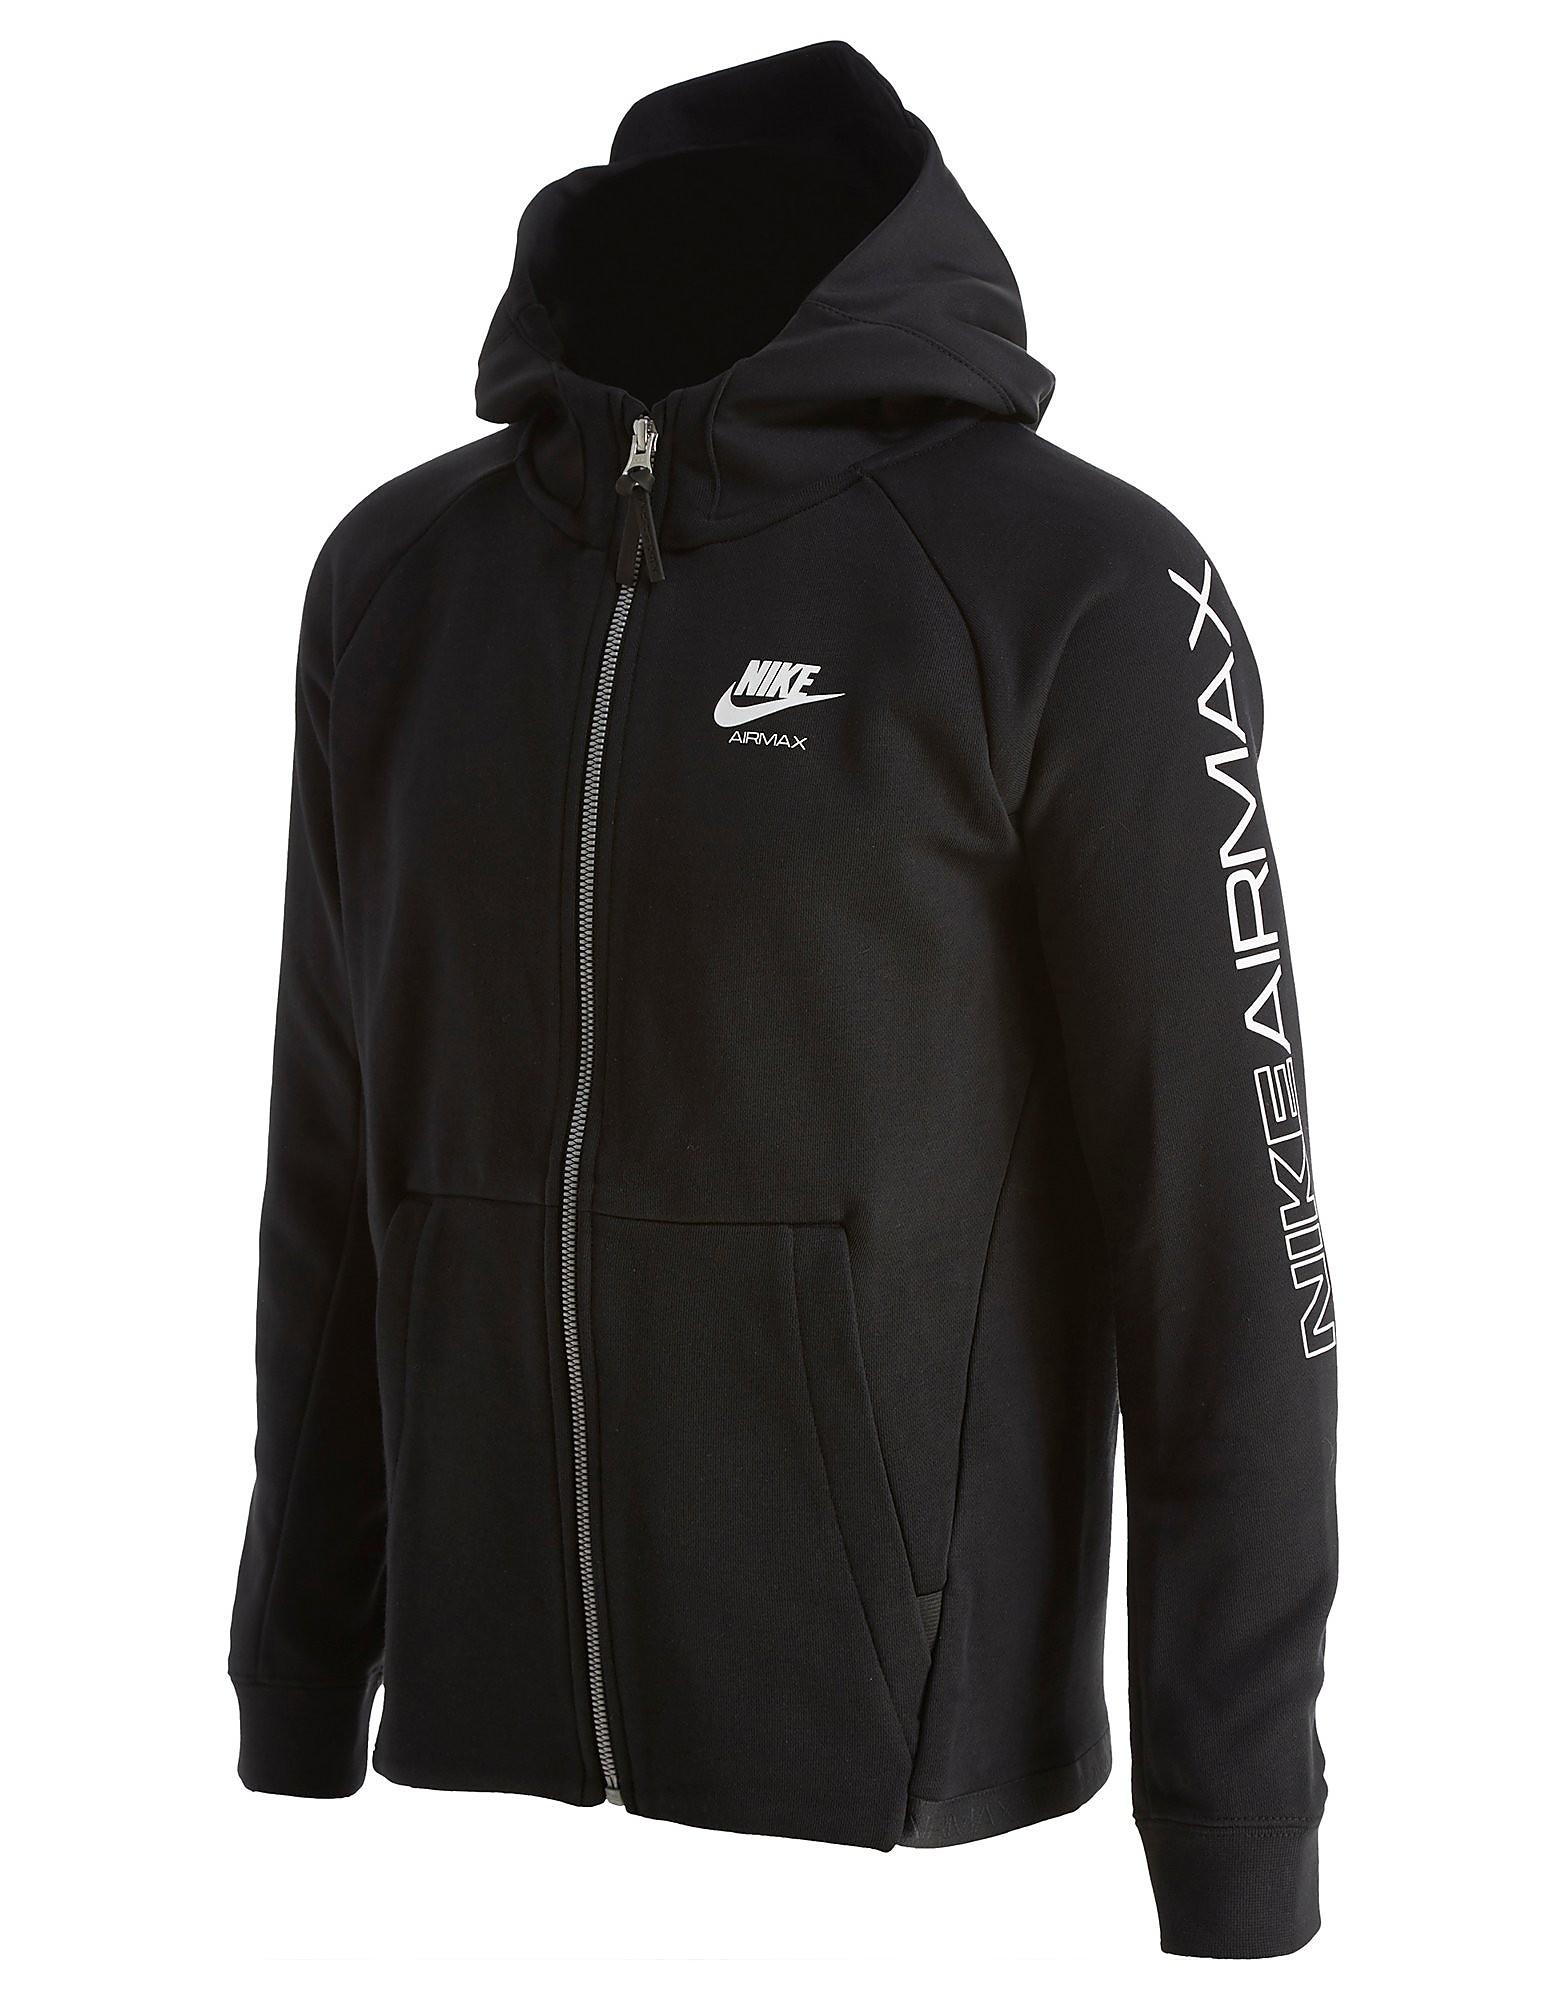 Nike Air Max Hoodie Mit Durchgehendem RV Junior